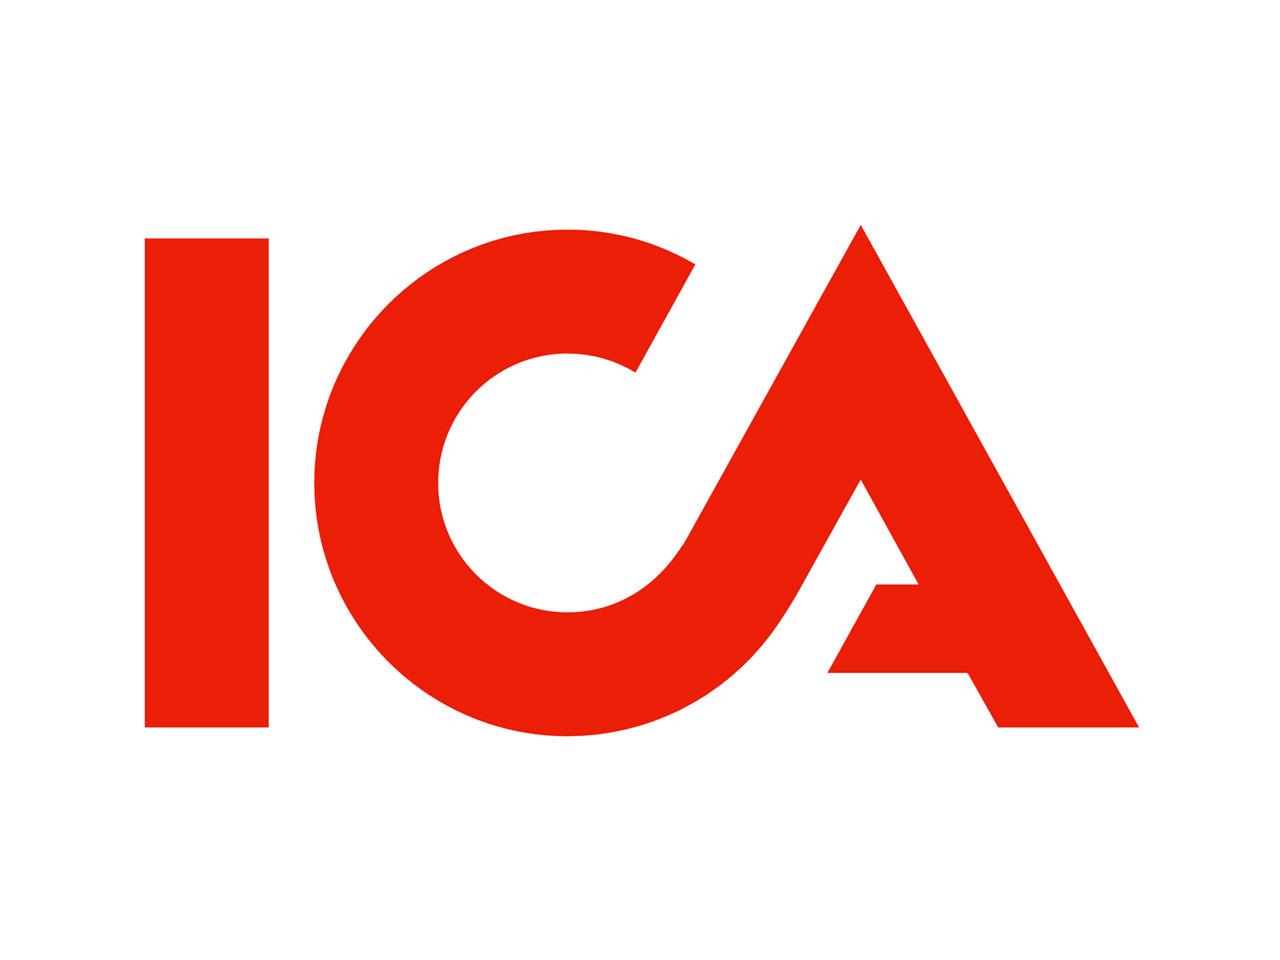 ica-logo-share